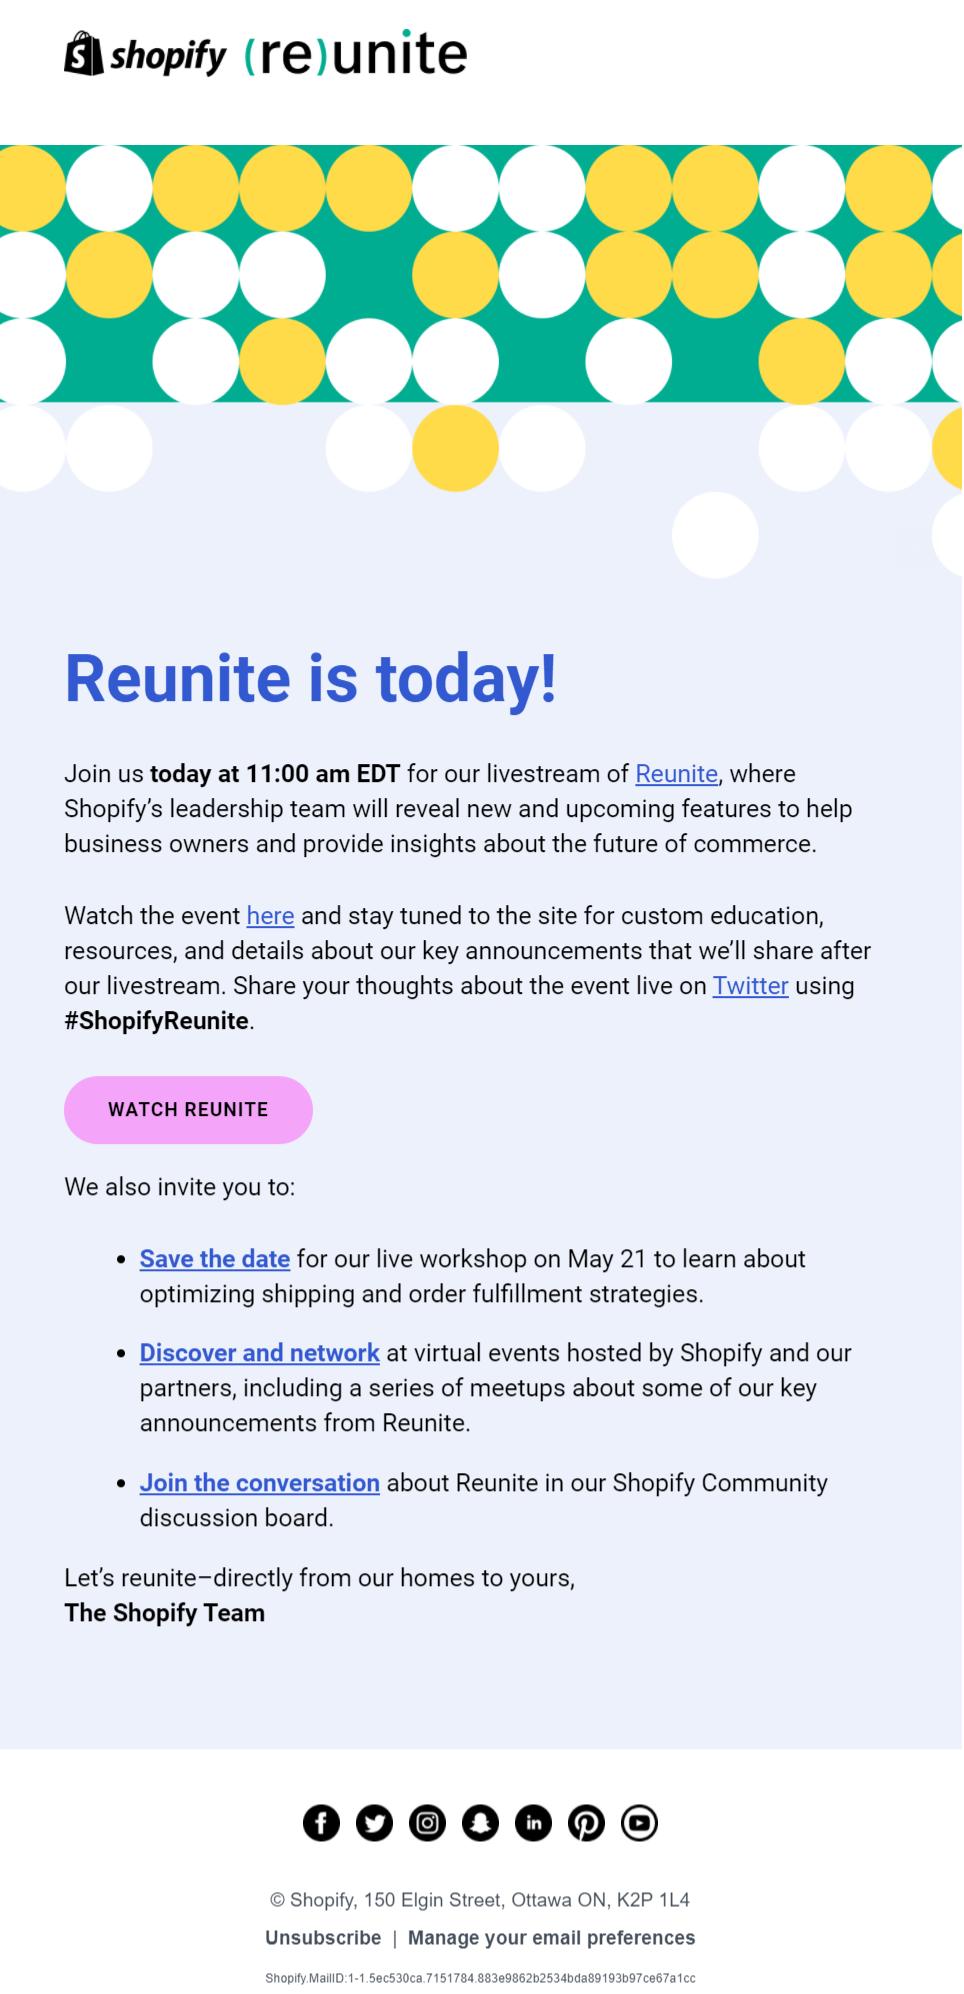 shopify's newsletter